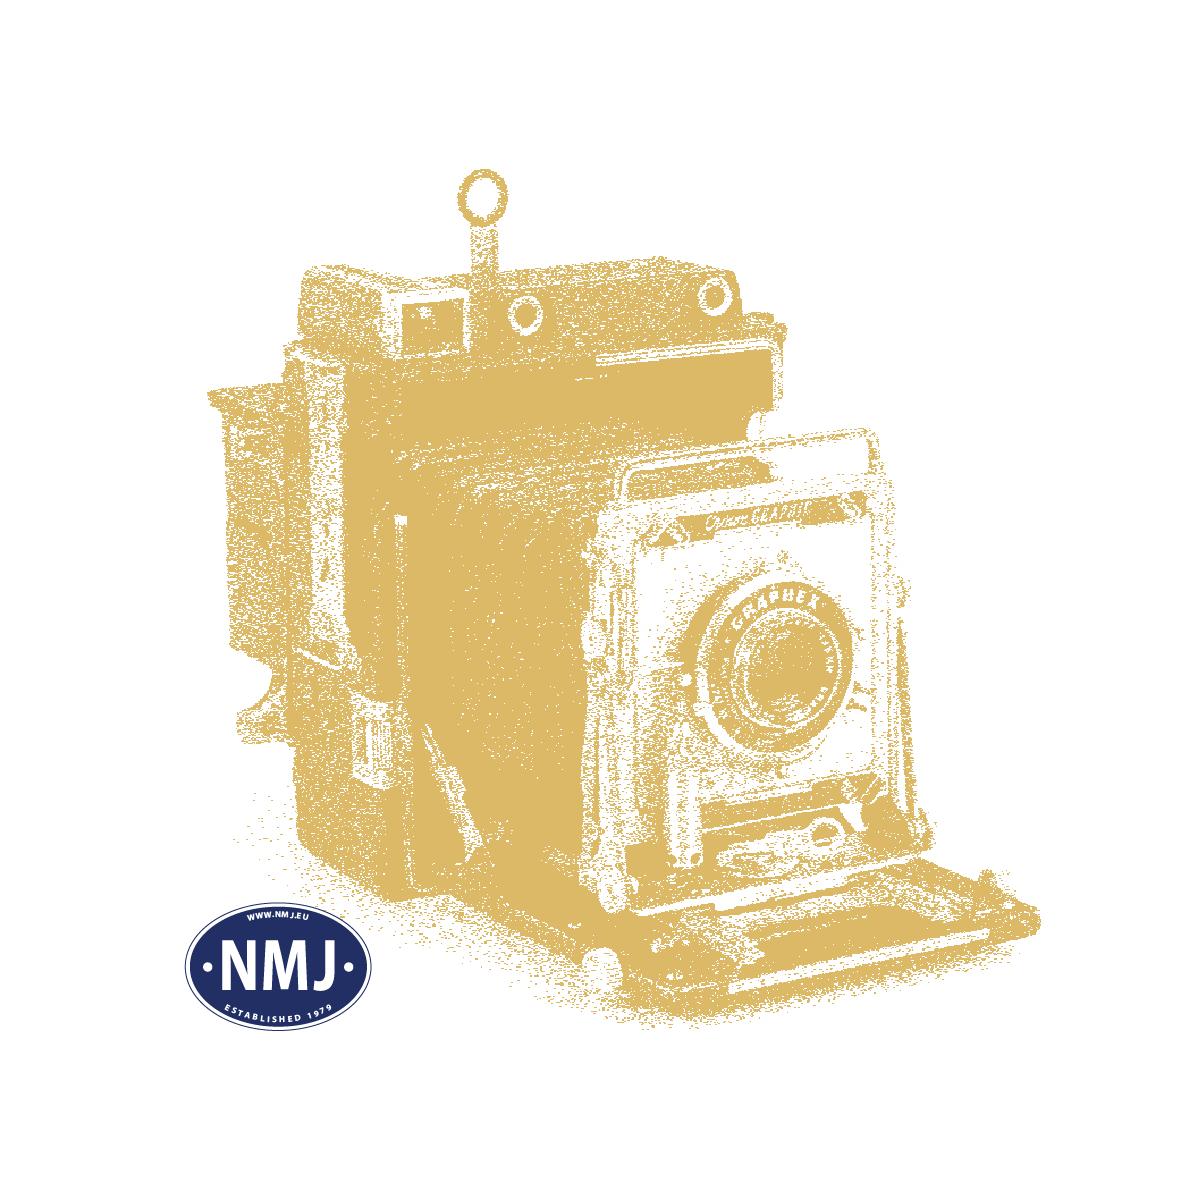 NMJT506.306 - NMJ Topline Xbms 40 76 953 5013-9 Rettungswagen der NSB